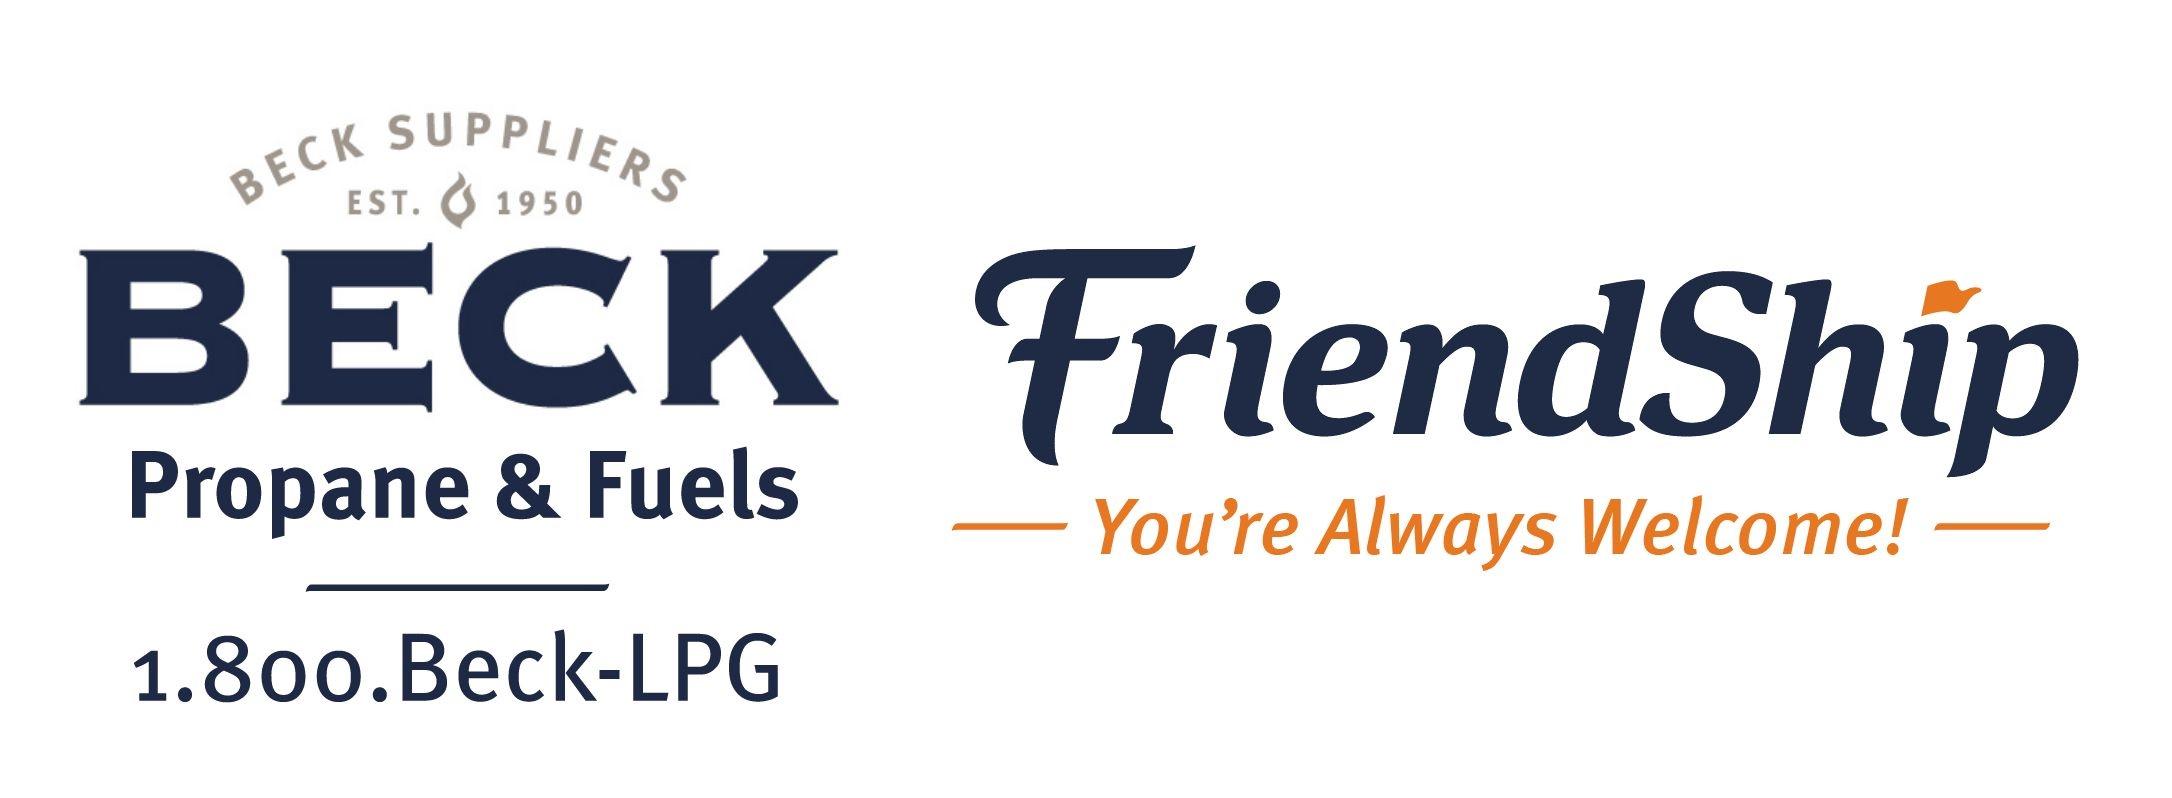 Beck_FriendShip_Side-By-Side.jpg